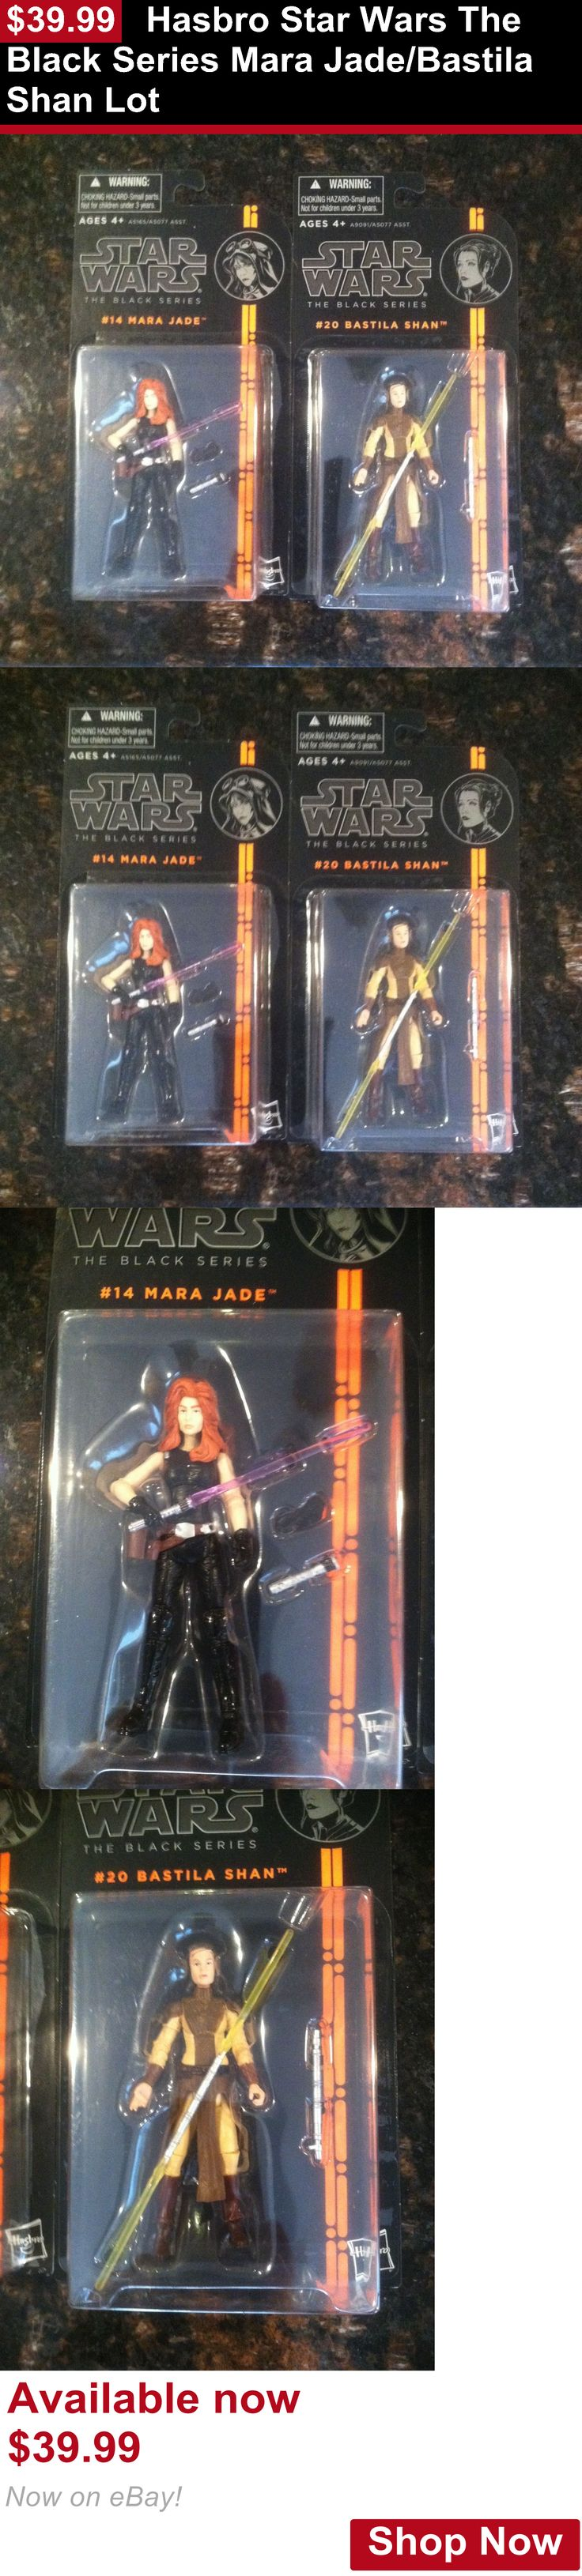 Telescope Mirrors And Prisms: Hasbro Star Wars The Black Series Mara Jade/Bastila Shan Lot BUY IT NOW ONLY: $39.99